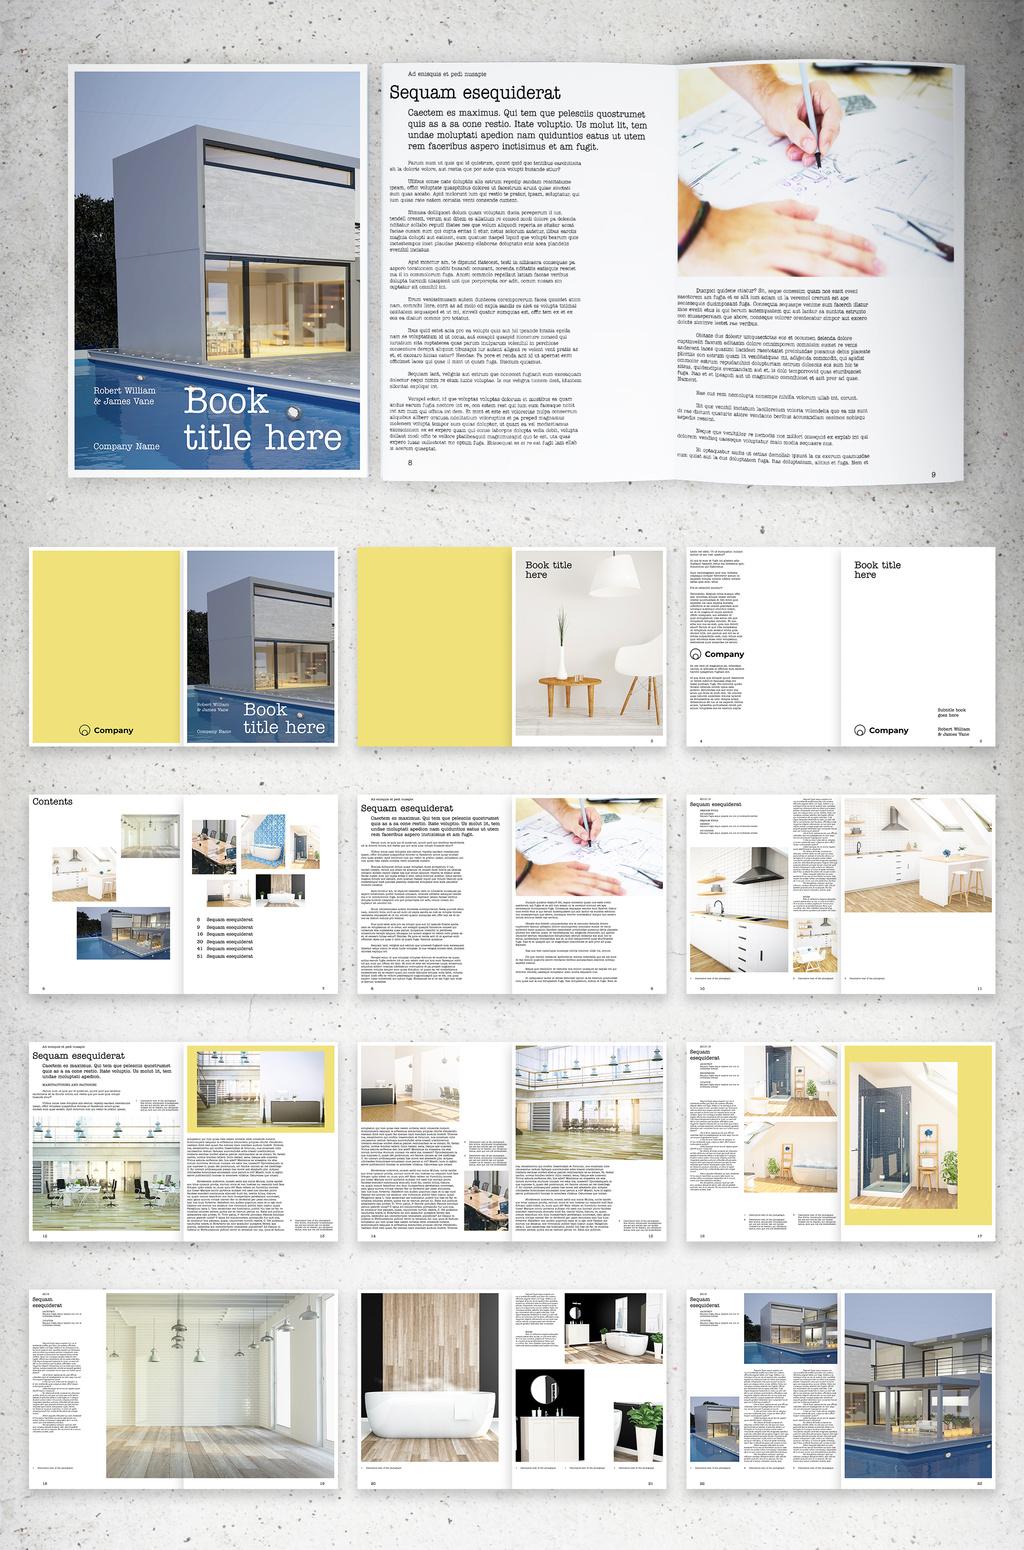 indesign-book-template